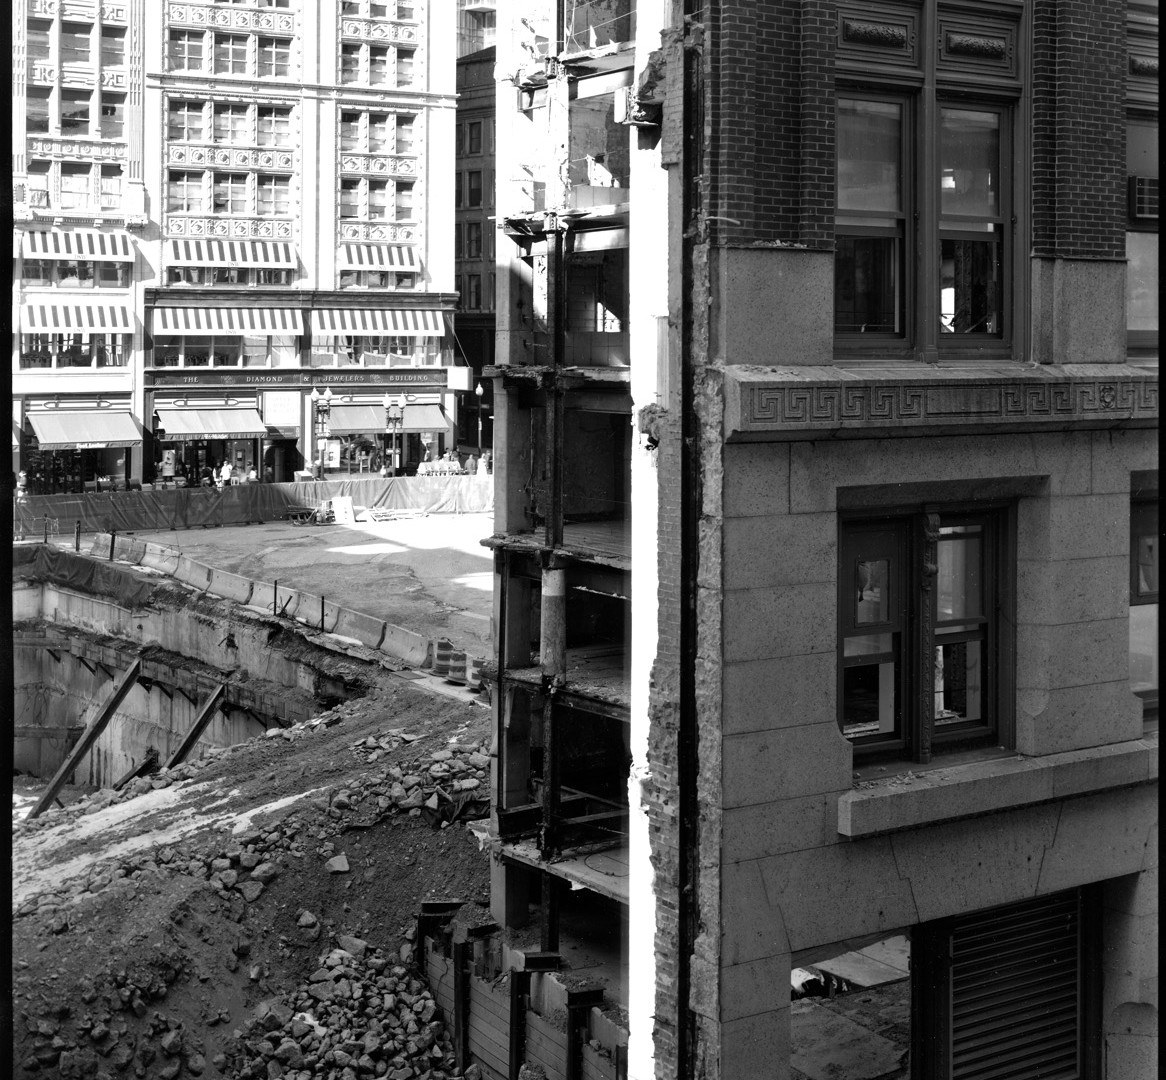 Nicholas Nixon, View of Washington Street, Boston, 2009